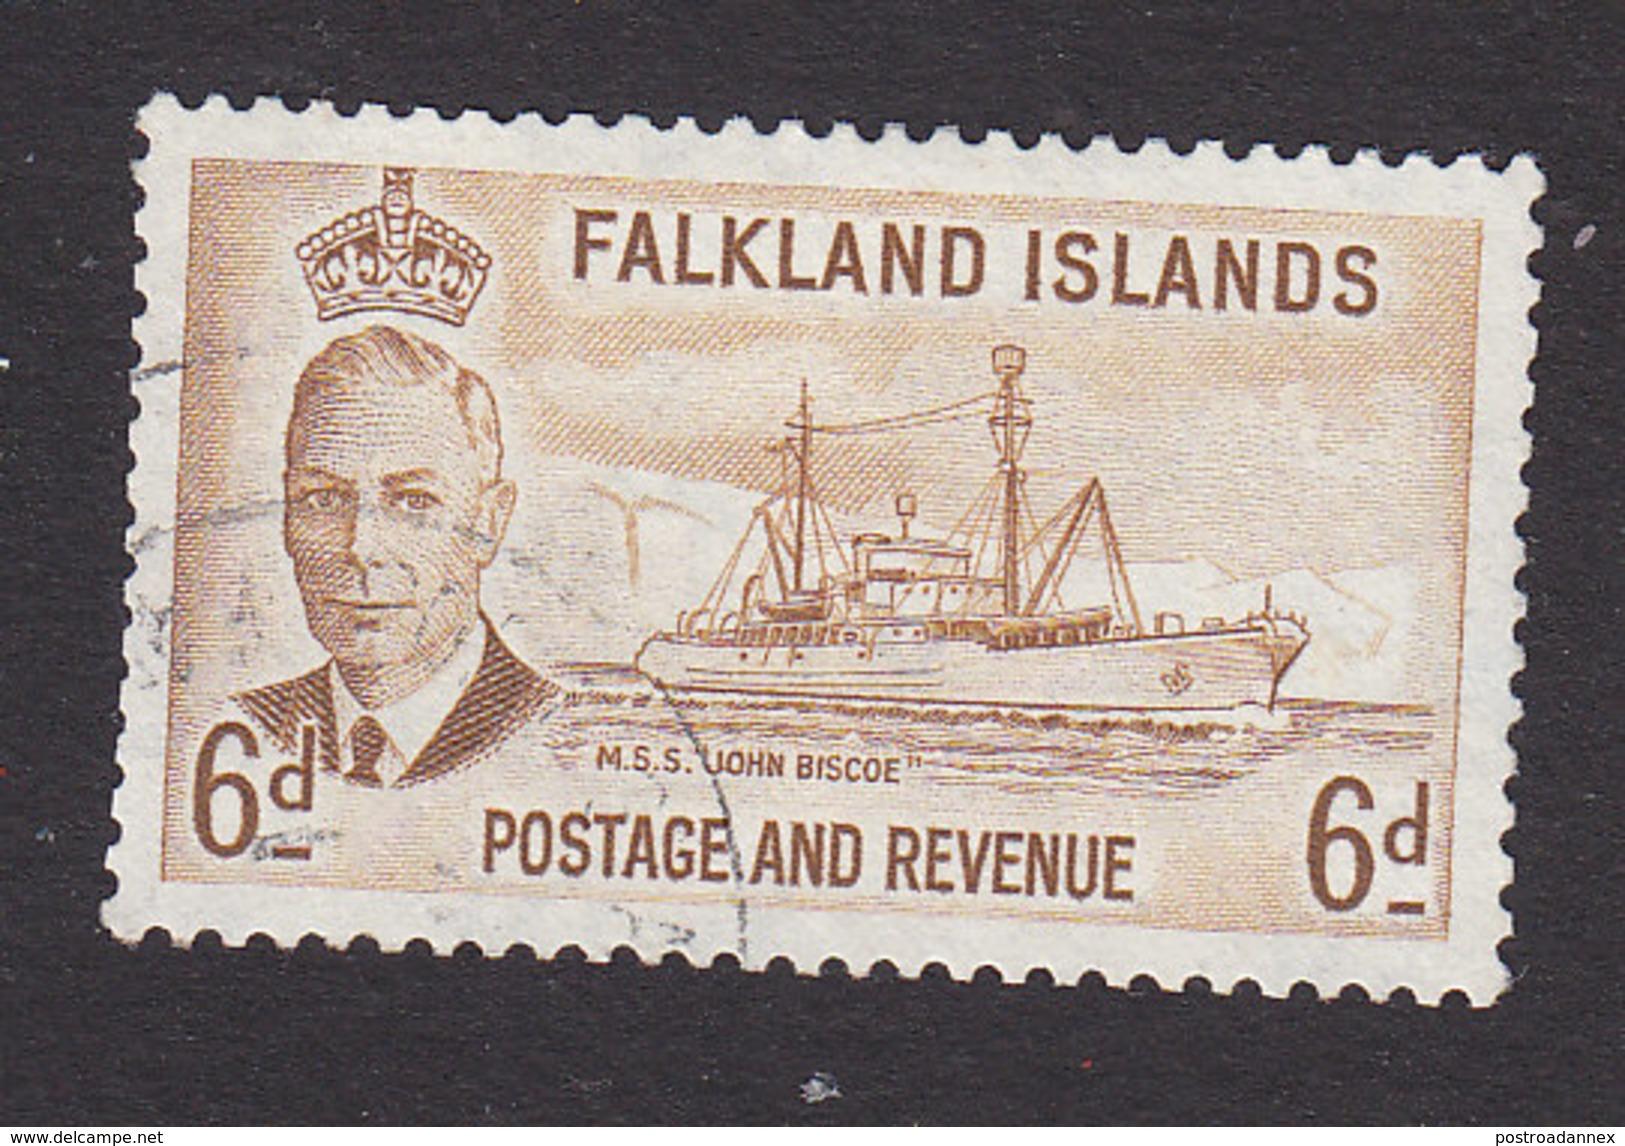 Falkland Islands, Scott #113, Used, George V And Industry Of Falkland Islands, Issued 1952 - Falkland Islands